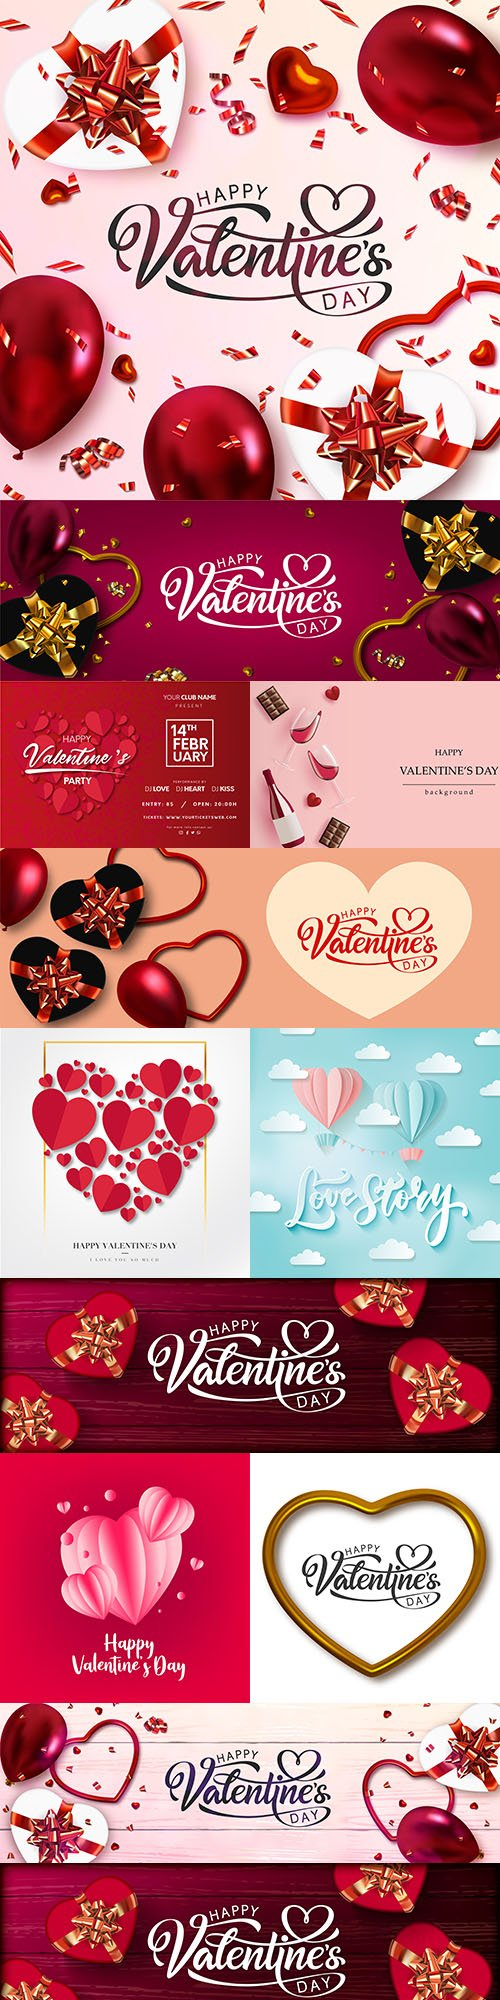 Valentine's Day romantic elements decorative illustrations 16